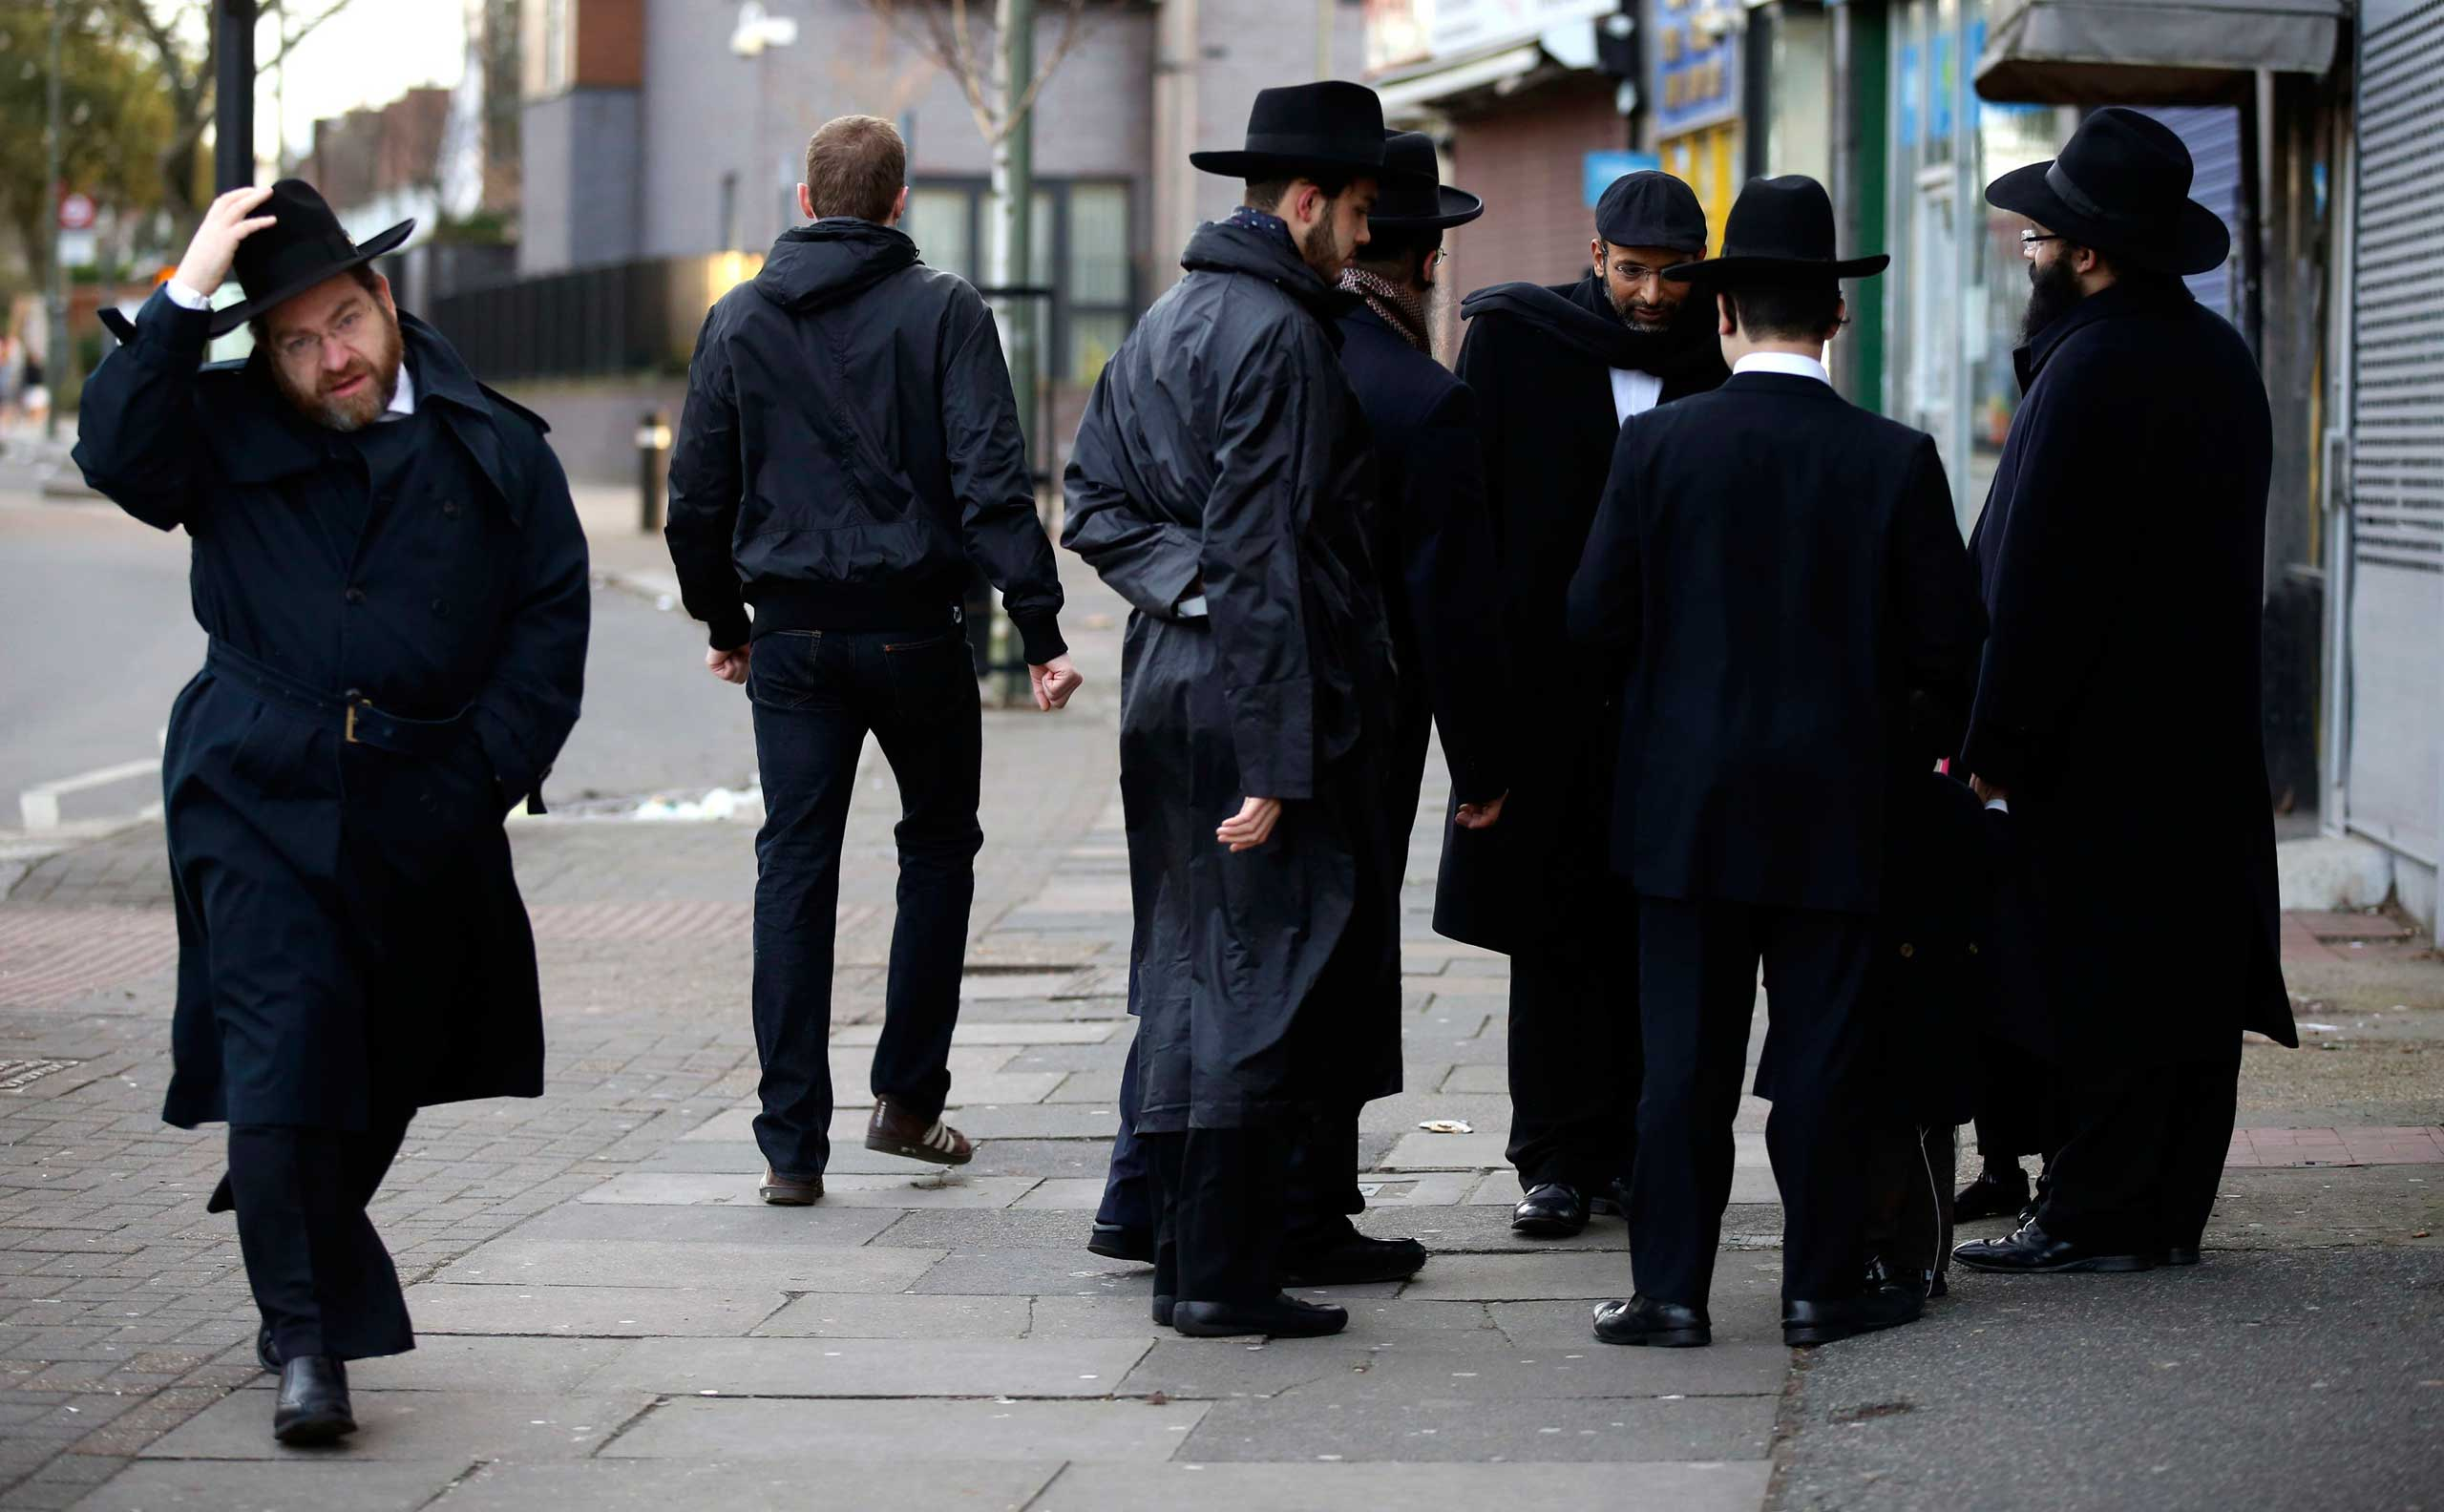 Jewish men talk in Golders Green, London, Jan. 10, 2015.